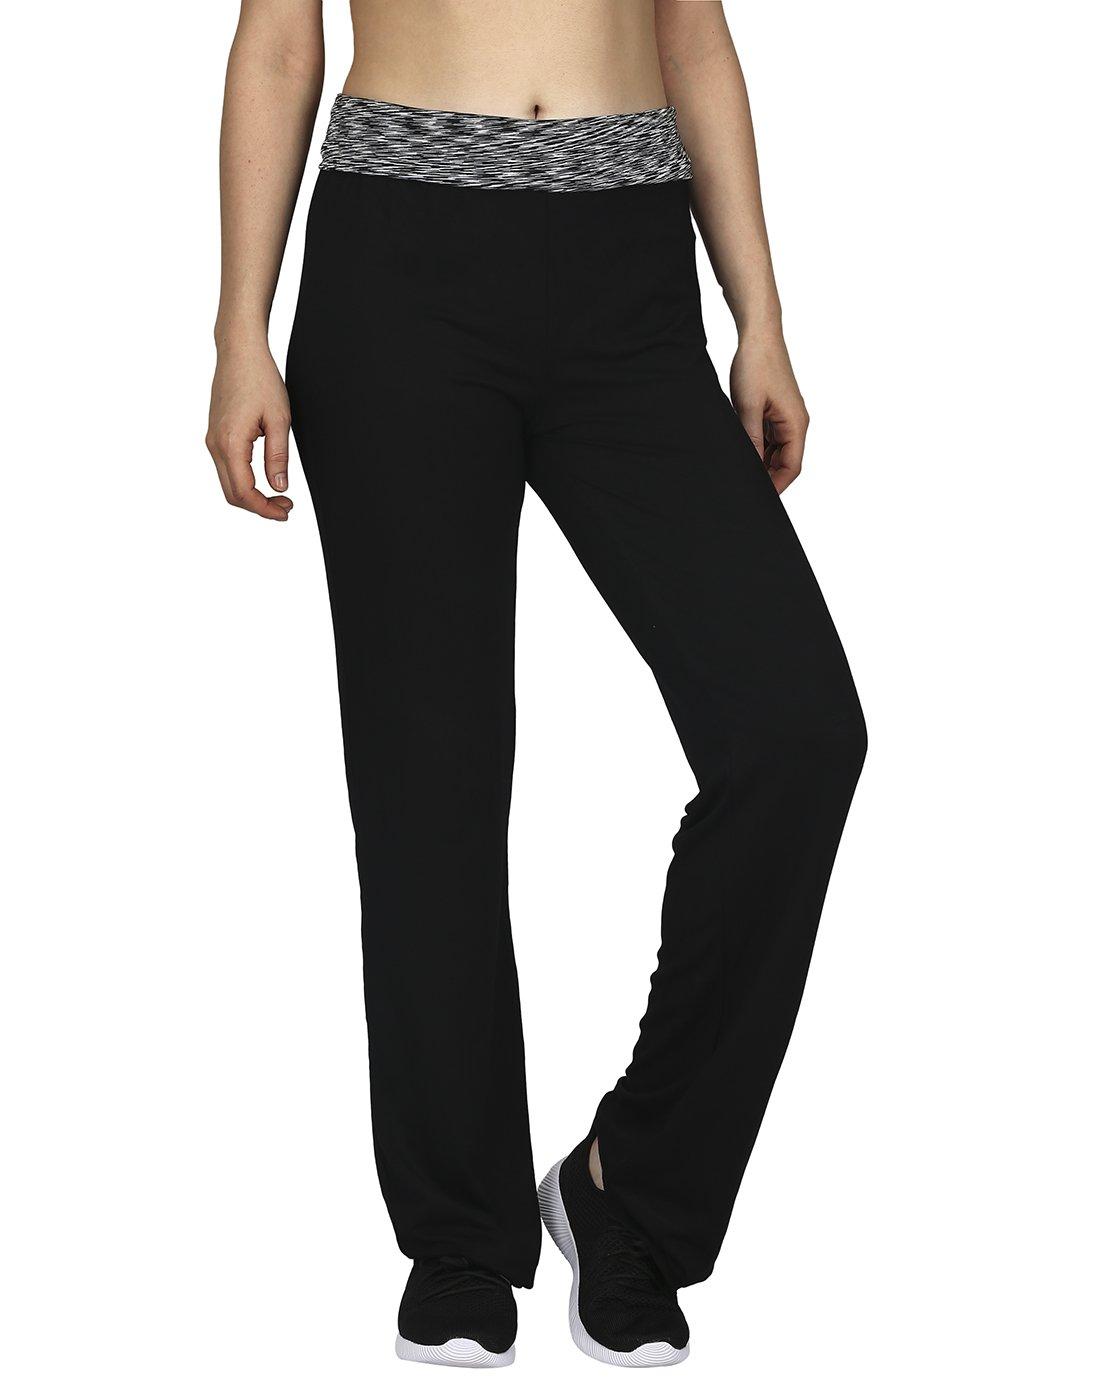 HDE Women's Maternity Yoga Pants Comfortable Lounge Pregnancy Pants Folded Waist,Black Grey Space Dye,XX-Large